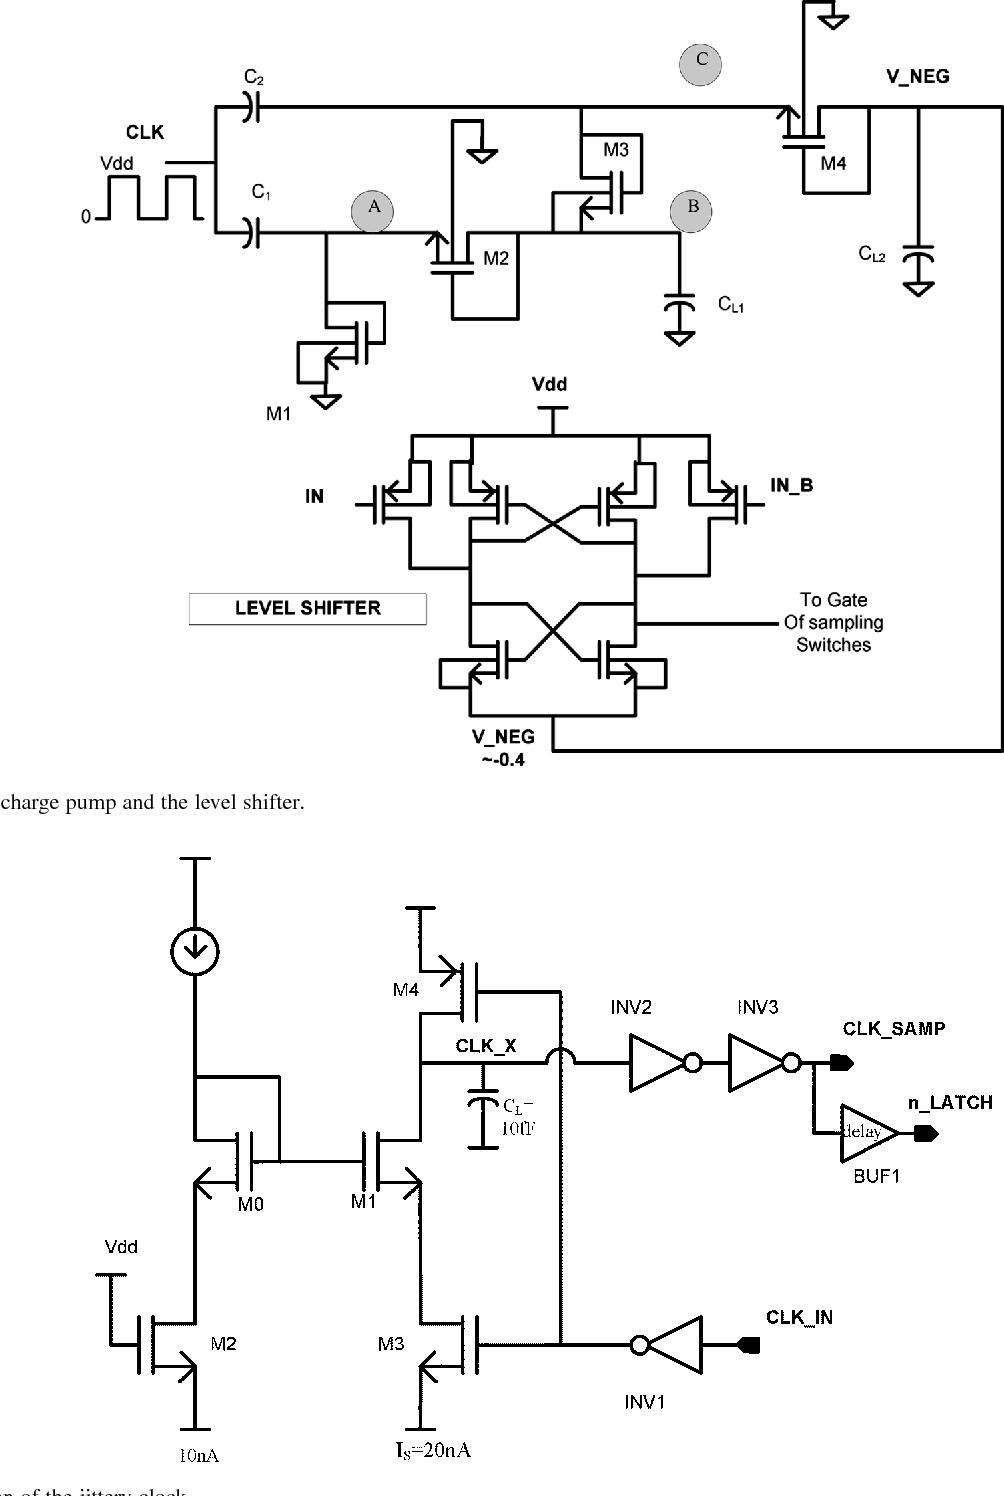 A 440 Na True Random Number Generator For Passive Rfid Tags Circuit Diagram Semantic Scholar